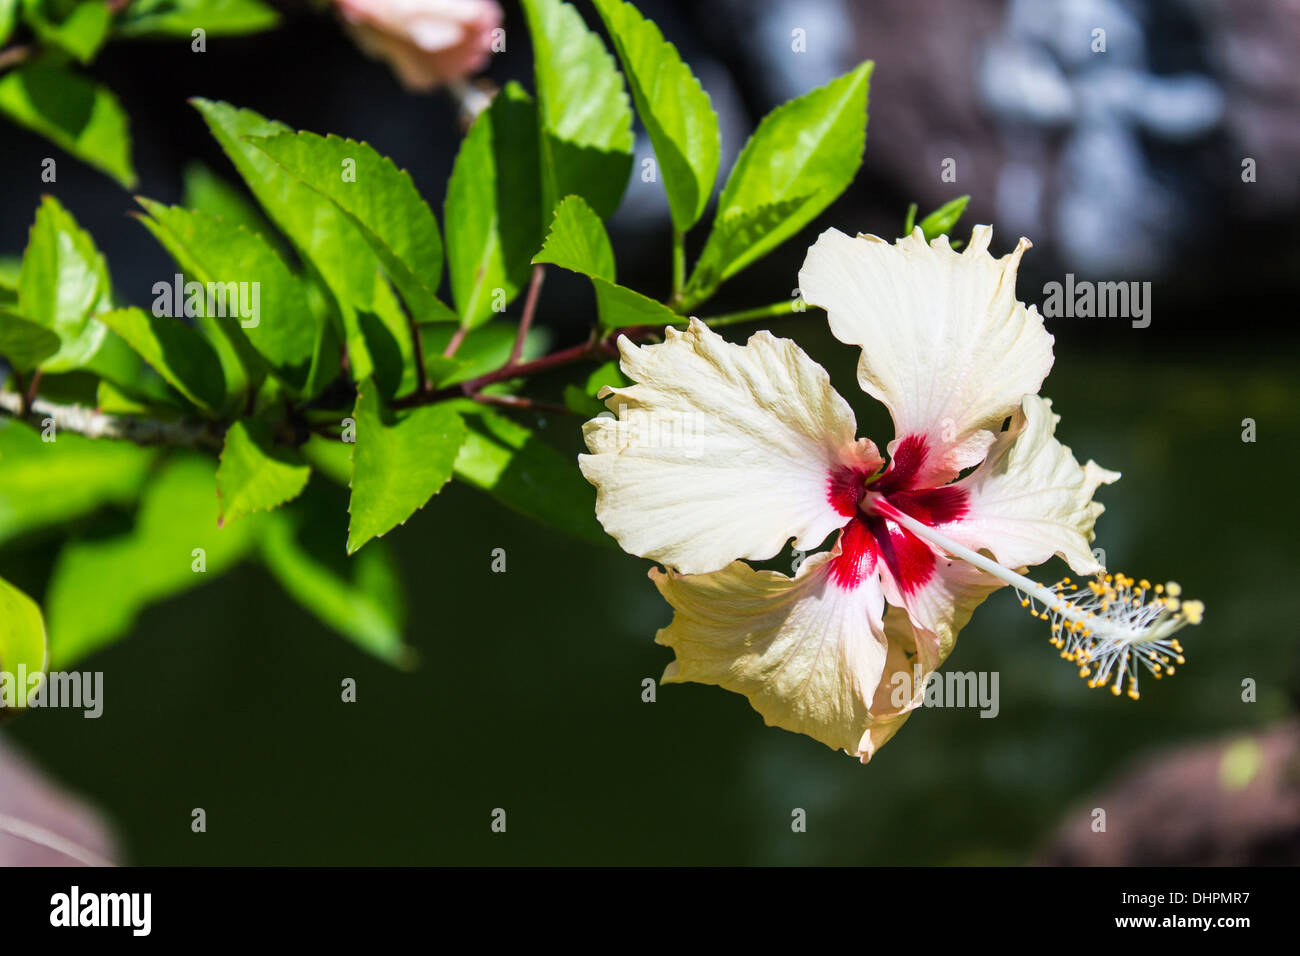 White Hibiscus Flowers Stock Photo: 62579531 - Alamy